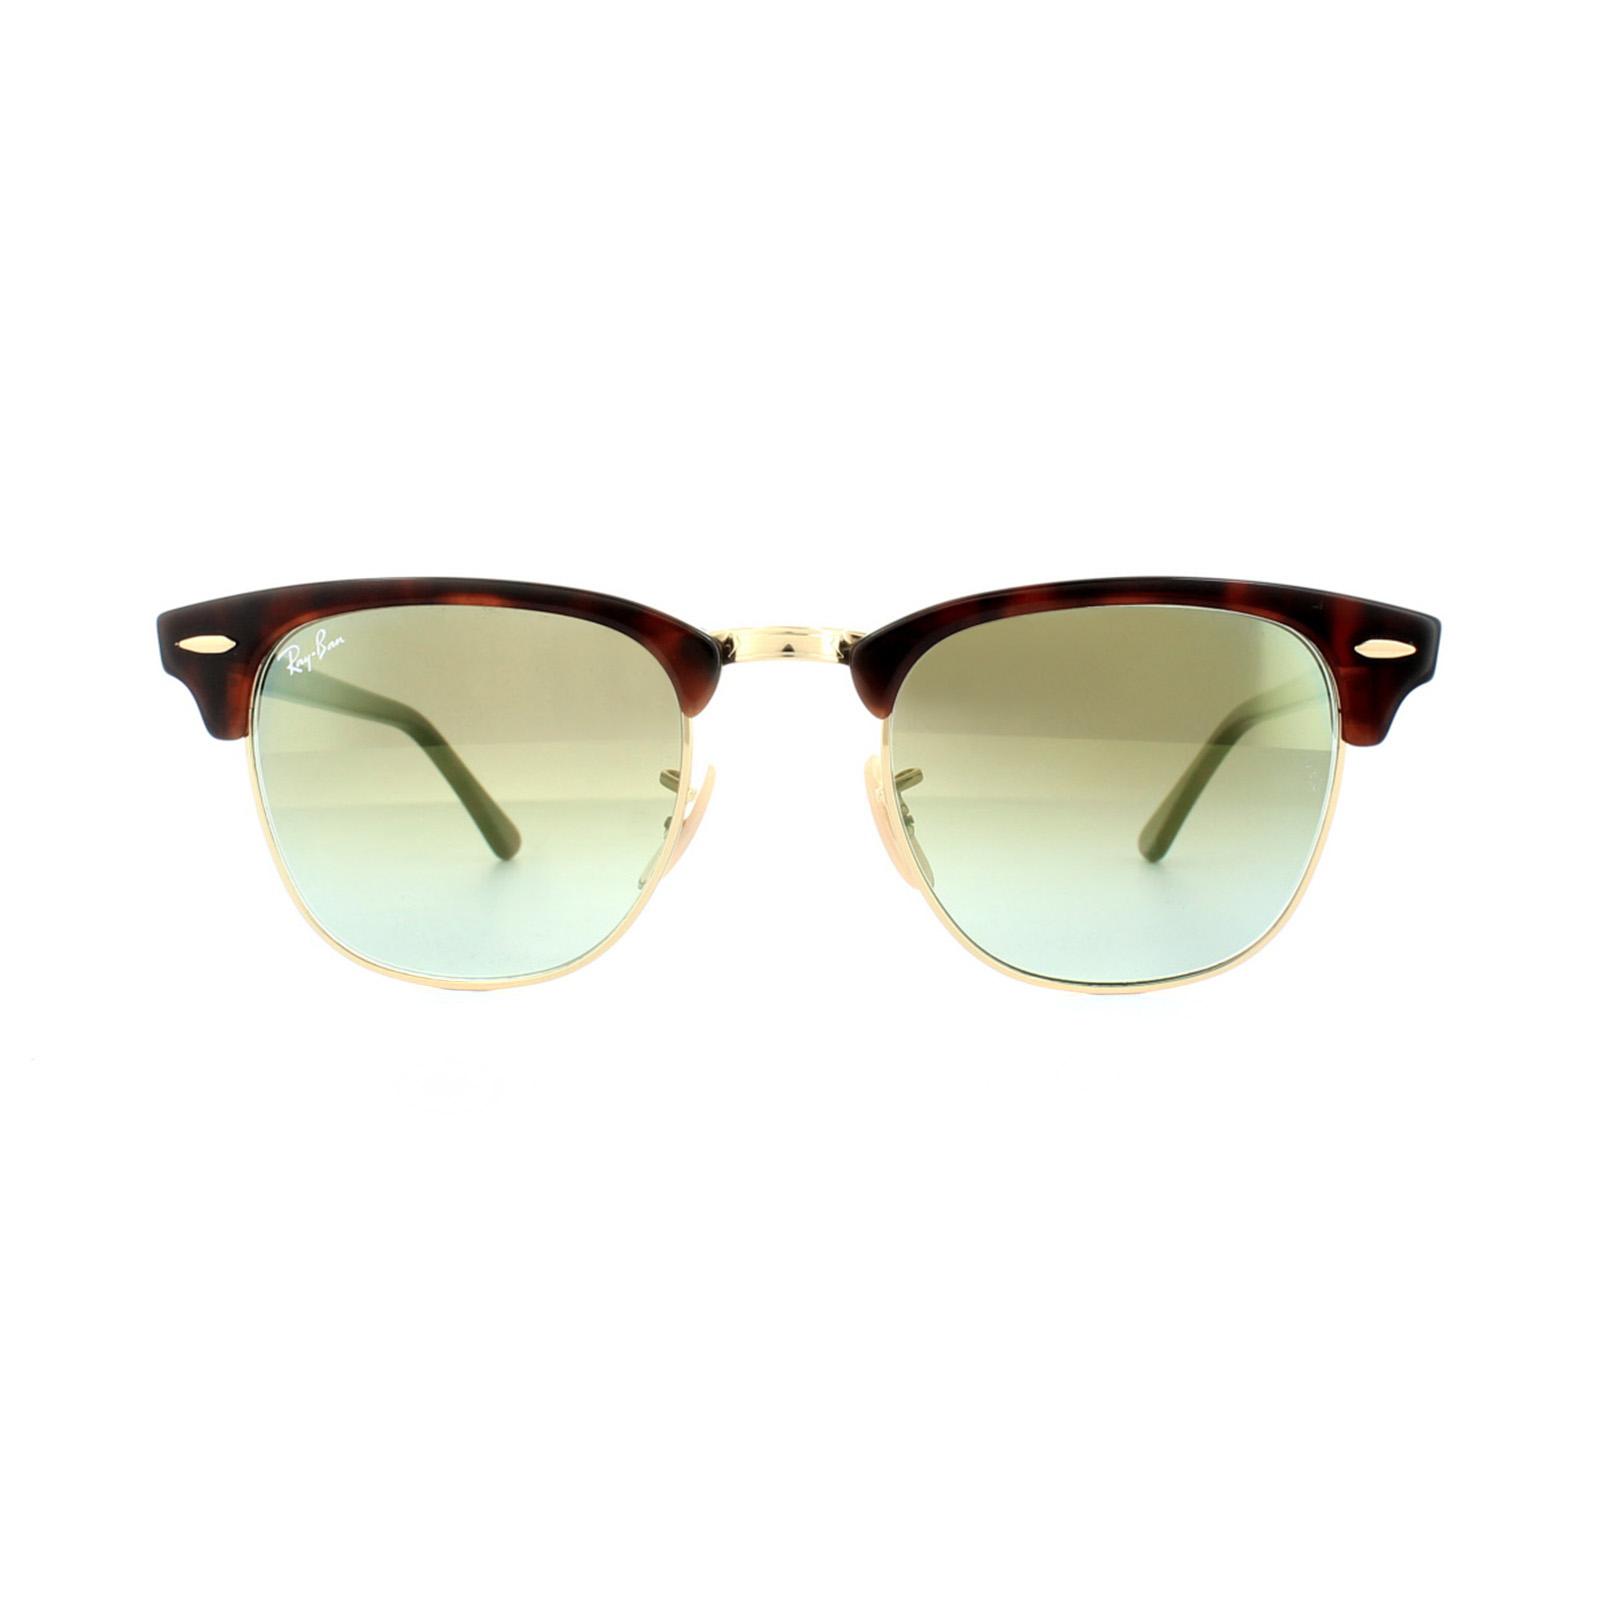 bdc505ff41 Sentinel Thumbnail 2. Sentinel Ray-Ban Sunglasses Clubmaster 3016 990 9J  Tortoise Green Gradient ...